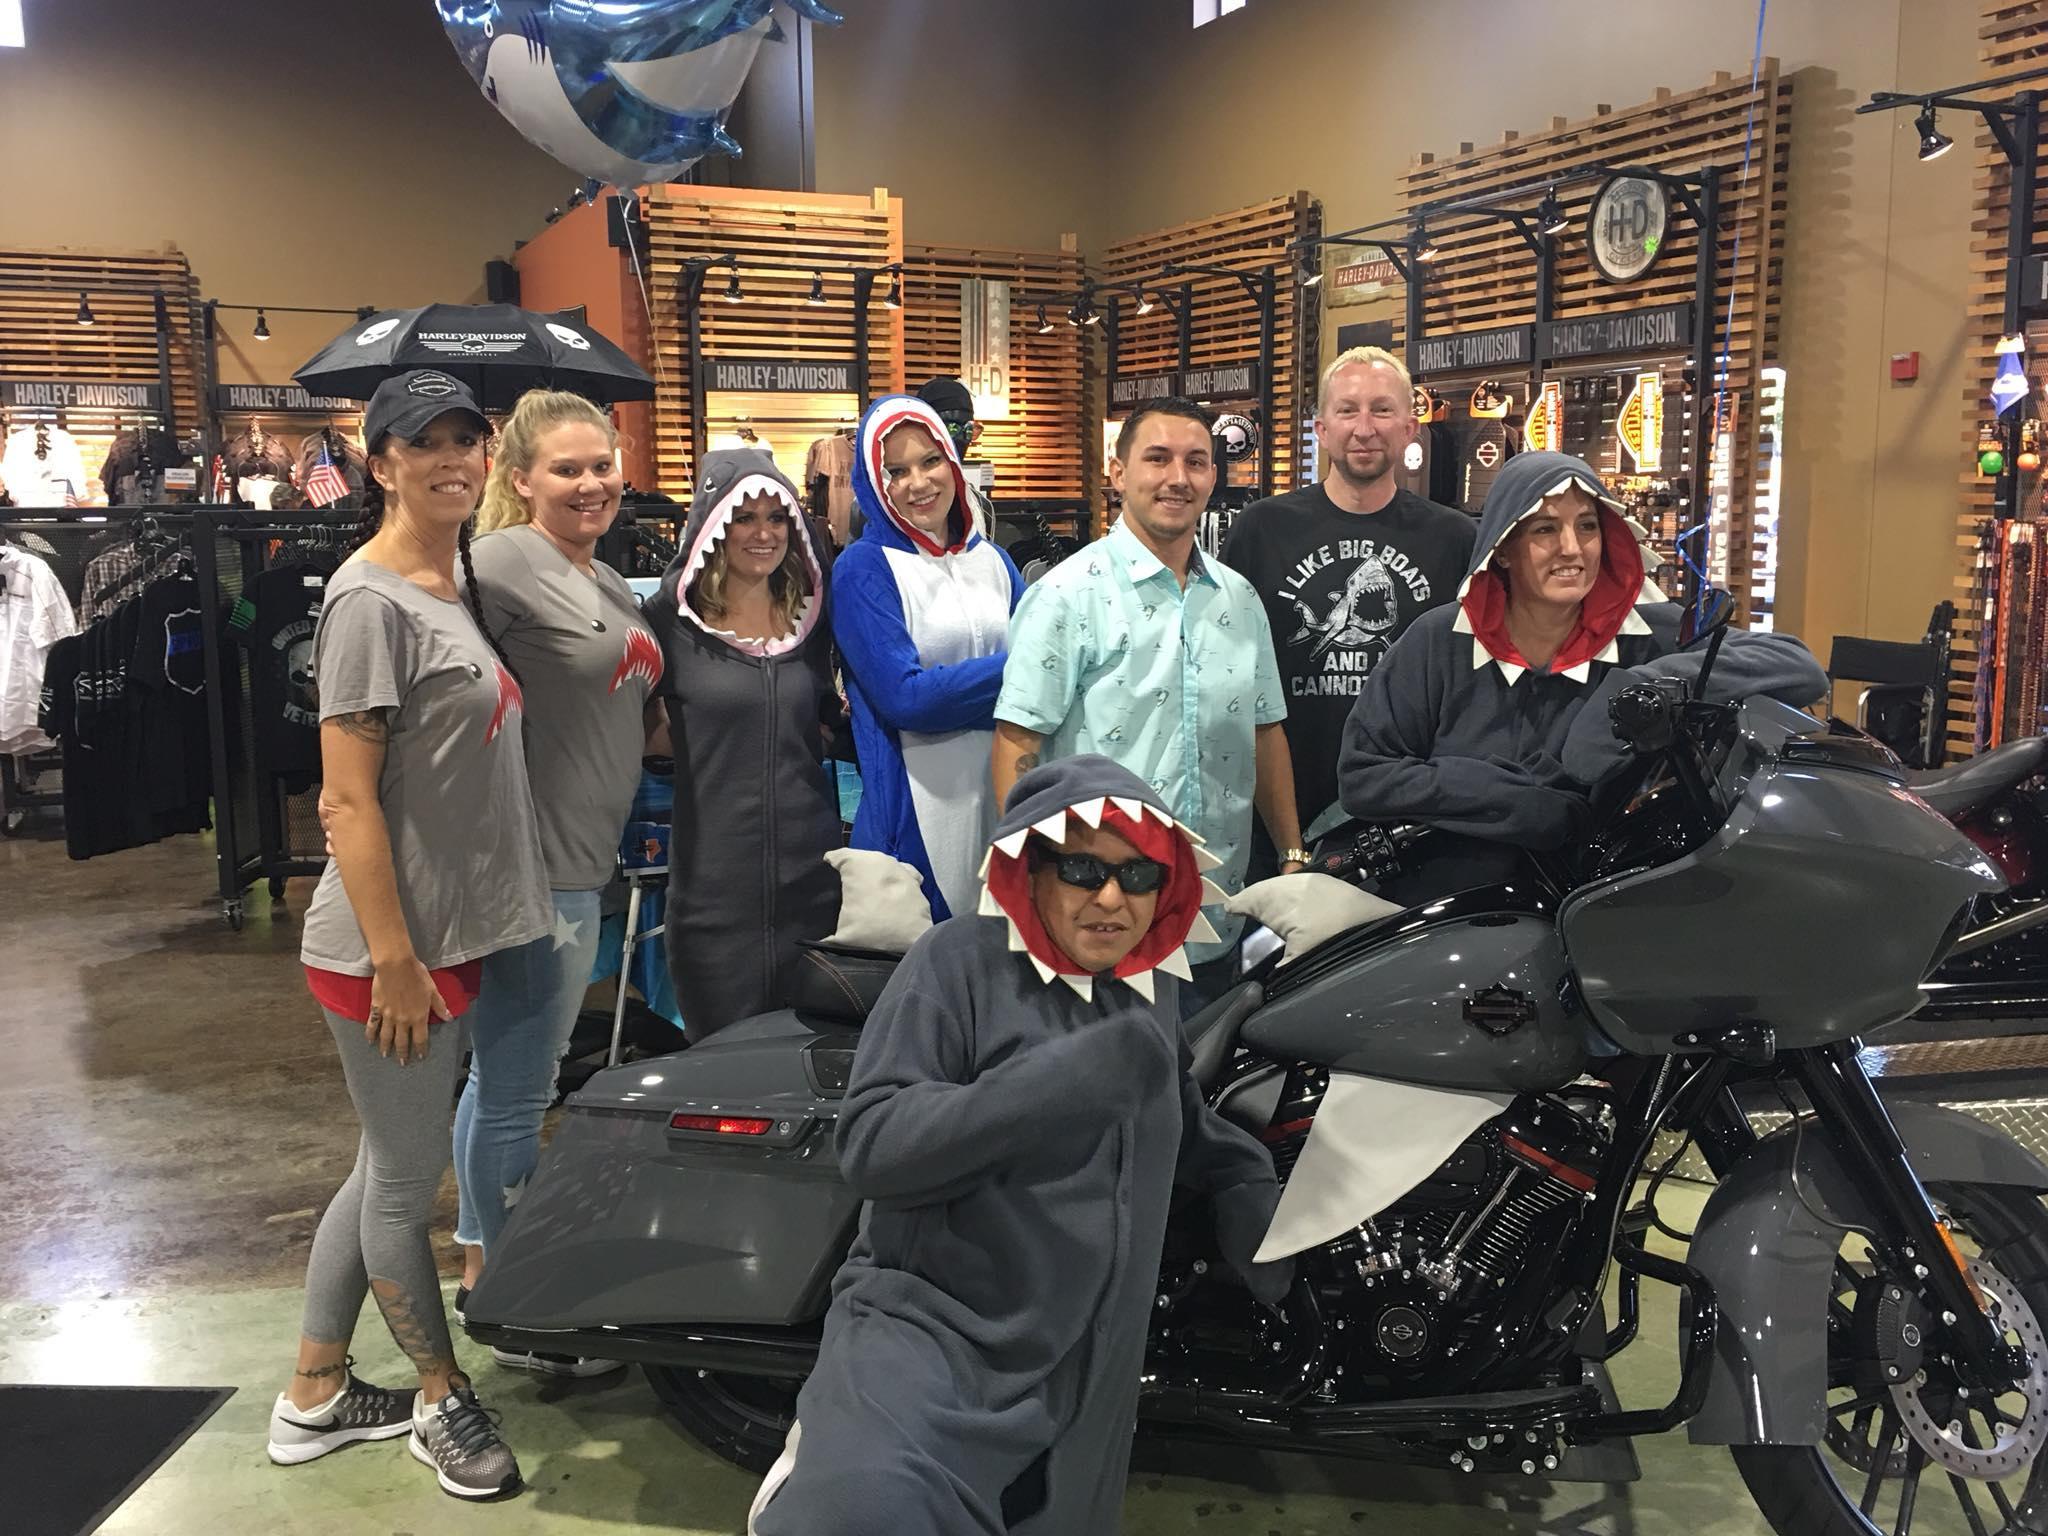 Central Texas Harley-Davidson image 0